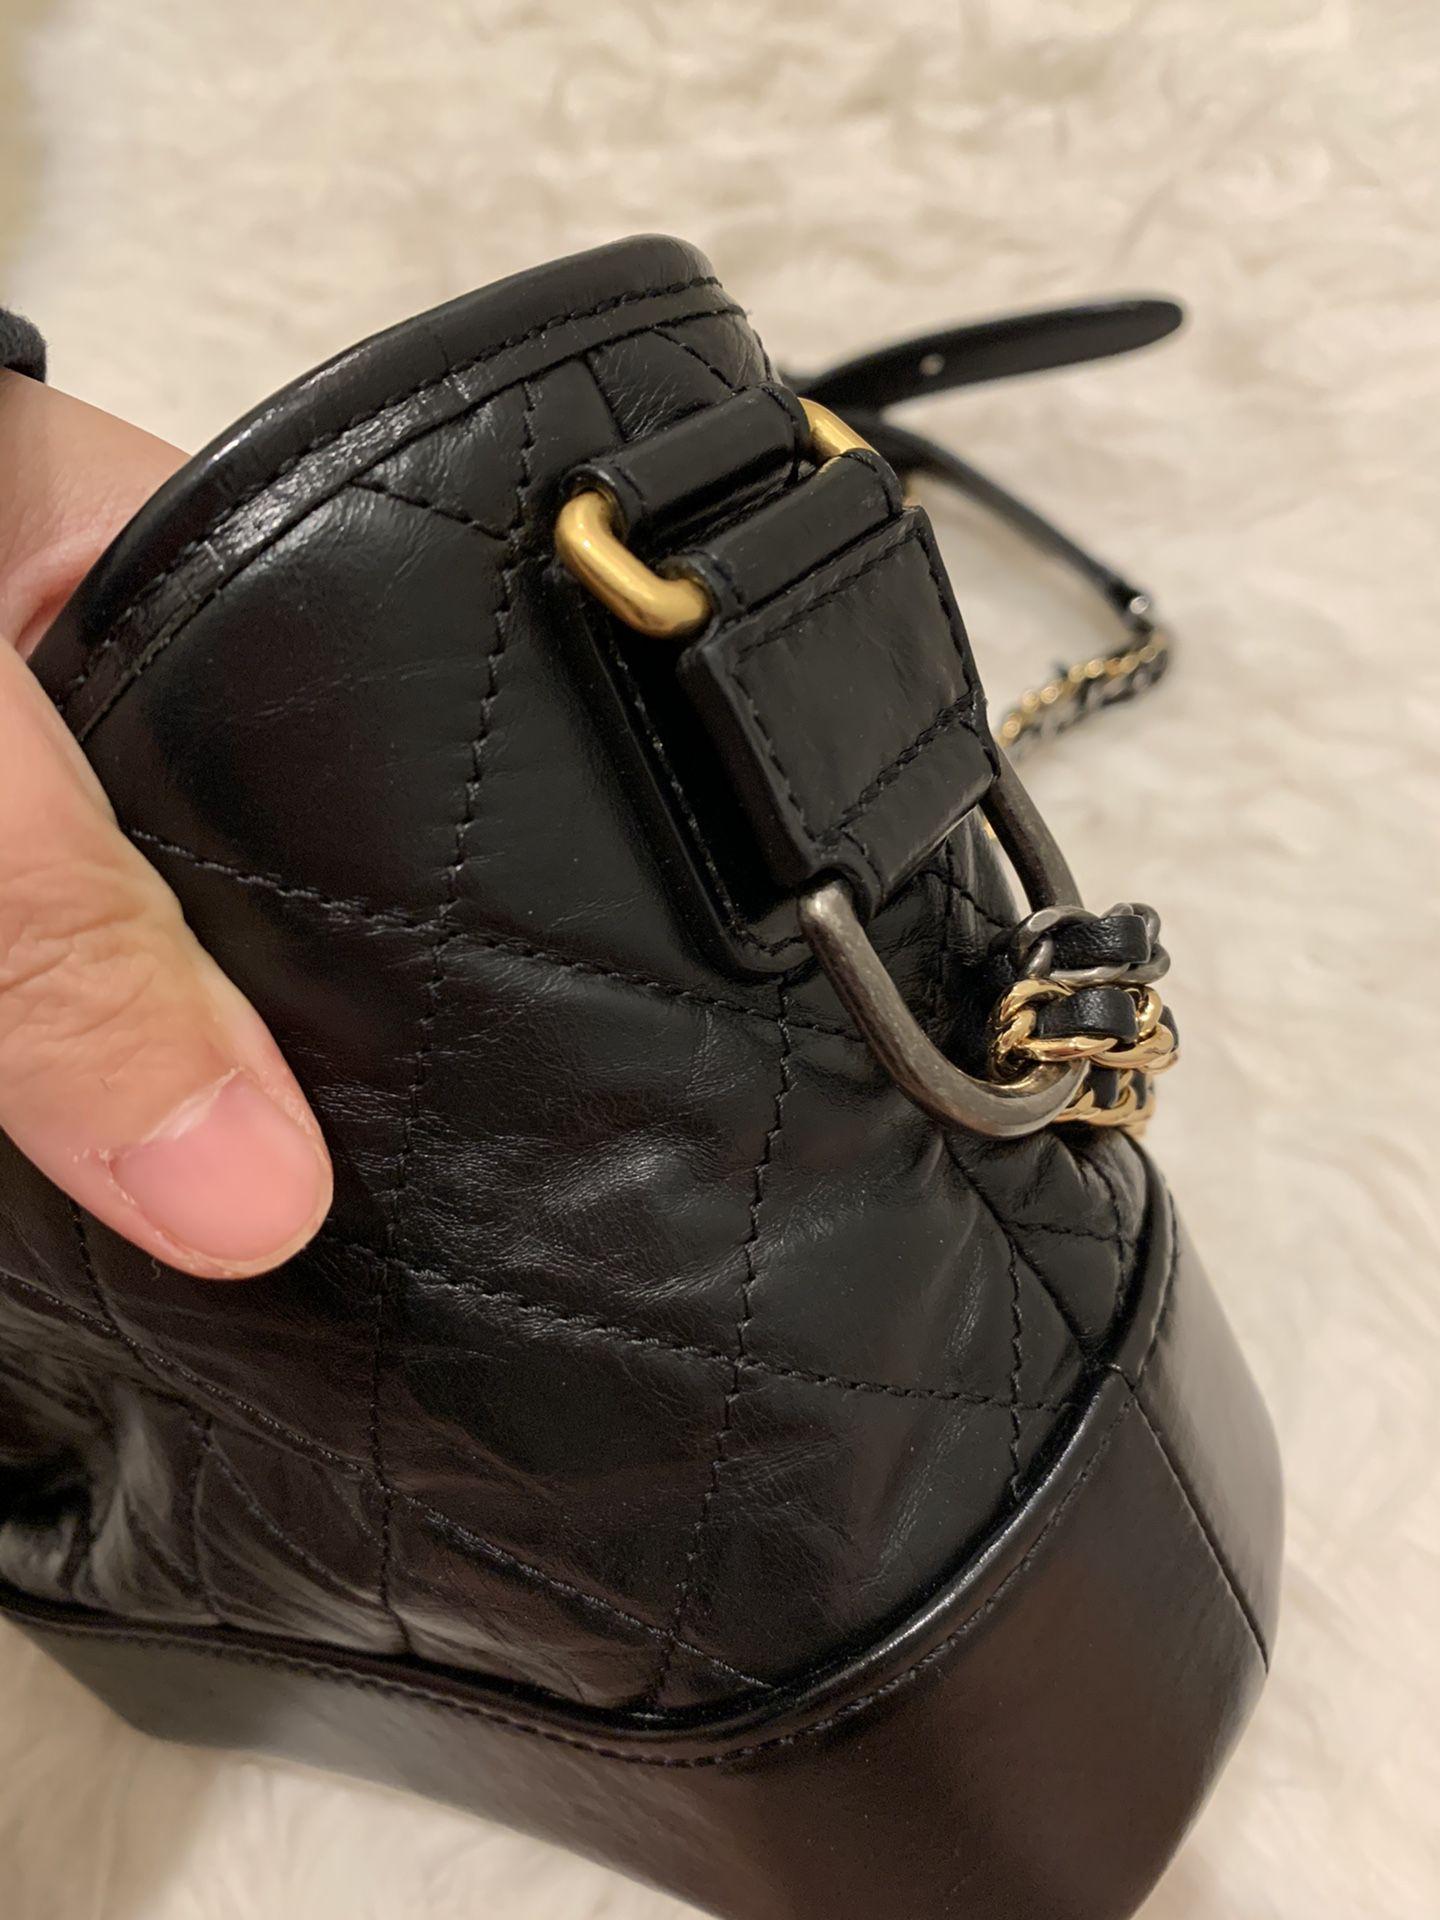 Authentic Chanel Gabrielle Hebo Black Bag,